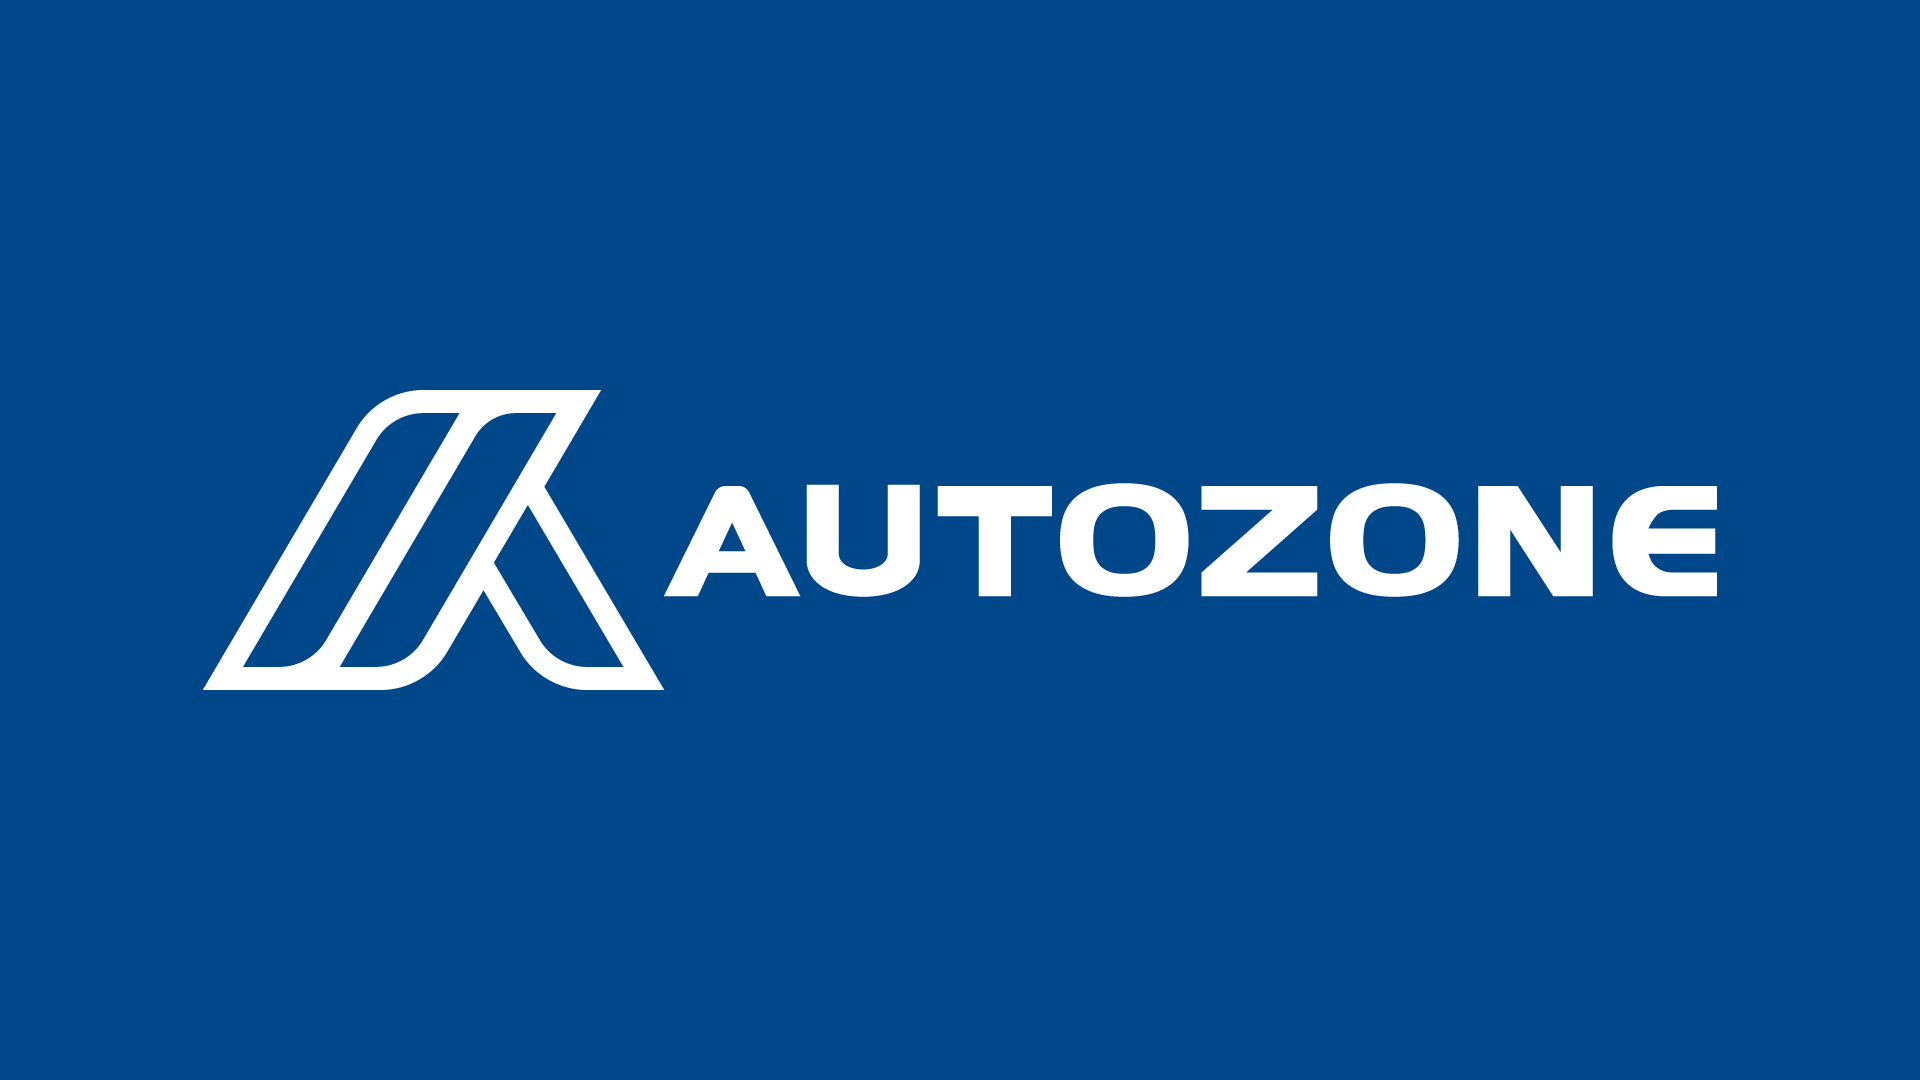 Autozone main logo